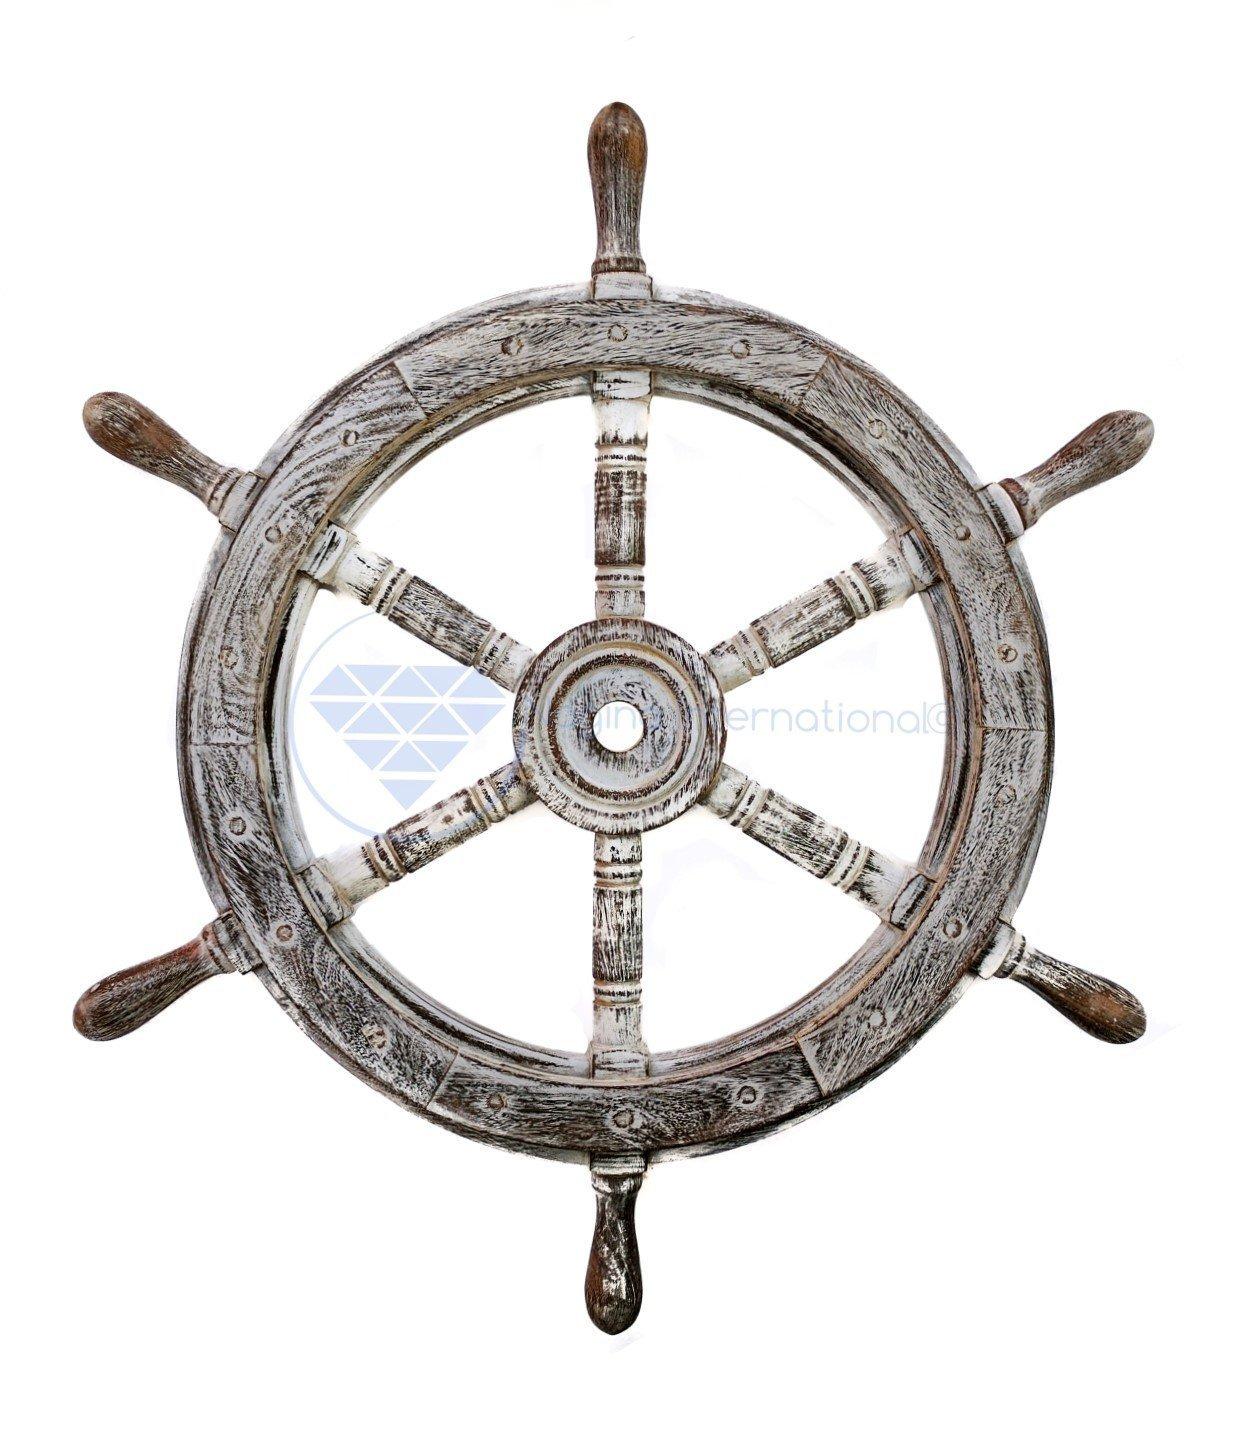 Nagina International(ナジャイナインターナショナル) Nautical高級ハンドクラフト木製操舵輪 | 海賊風家庭壁装飾&ギフト |42 Inches NWH008ABL B01FVSRZR6アンティーク ブラック 42 Inches